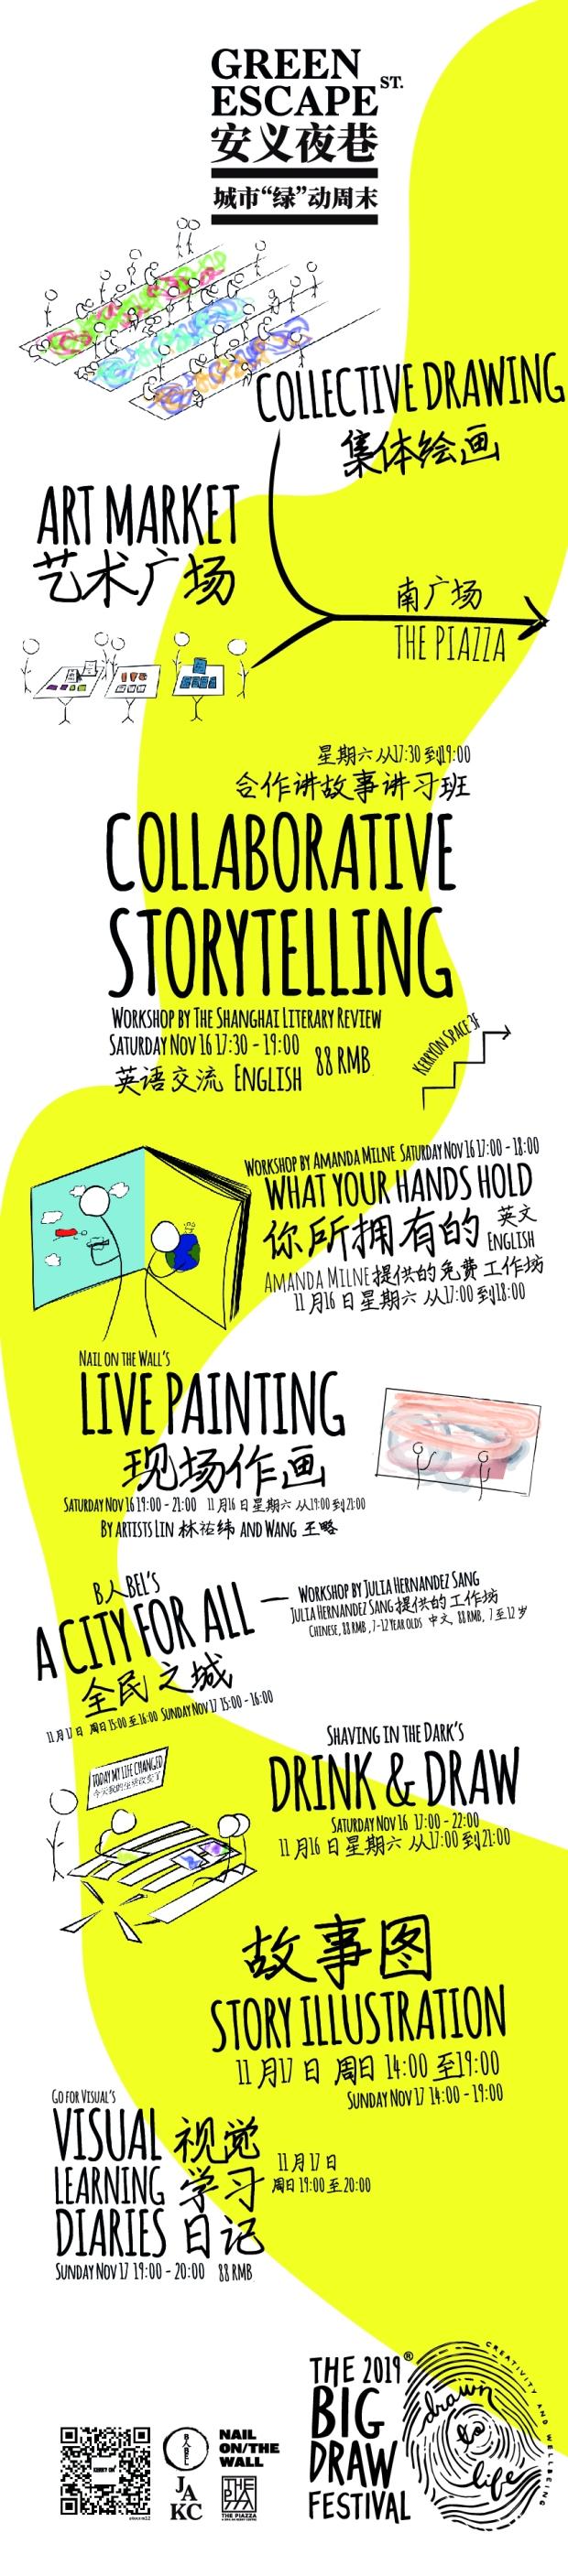 ---The full list of The 2019 Big Draw Festival  2019绘画节艺术活动清单